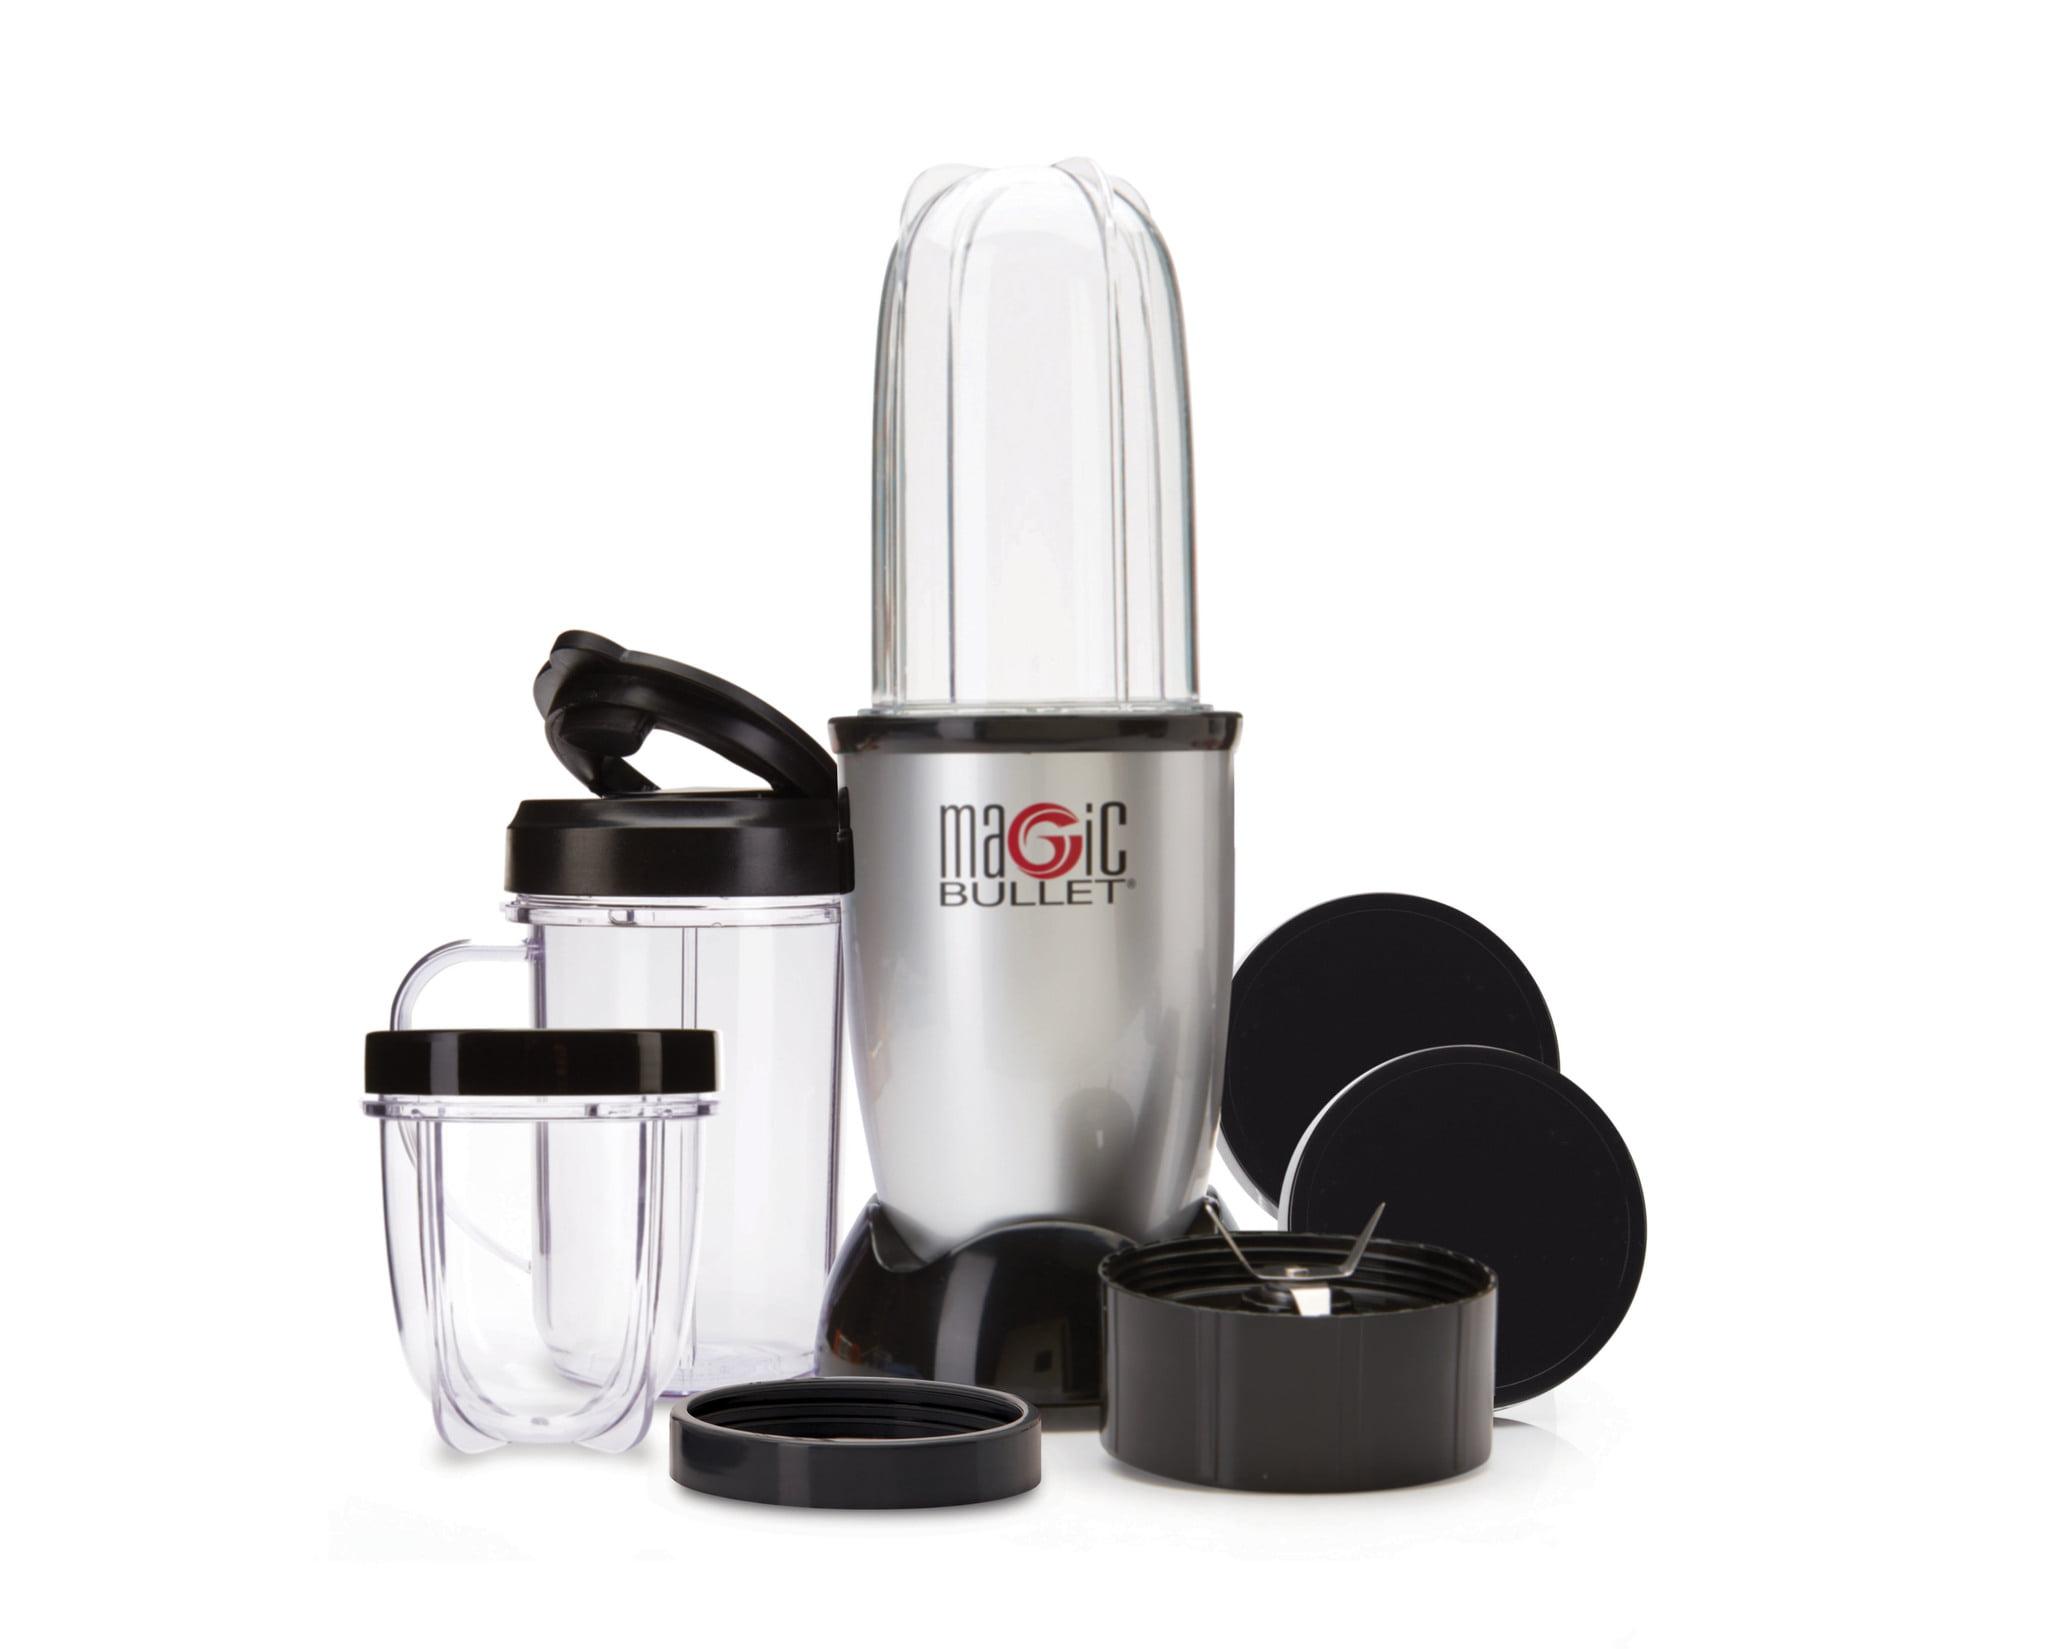 Magic Bullet 11-Piece Set Blender & Food Processor for Kitchen by Capital Brands